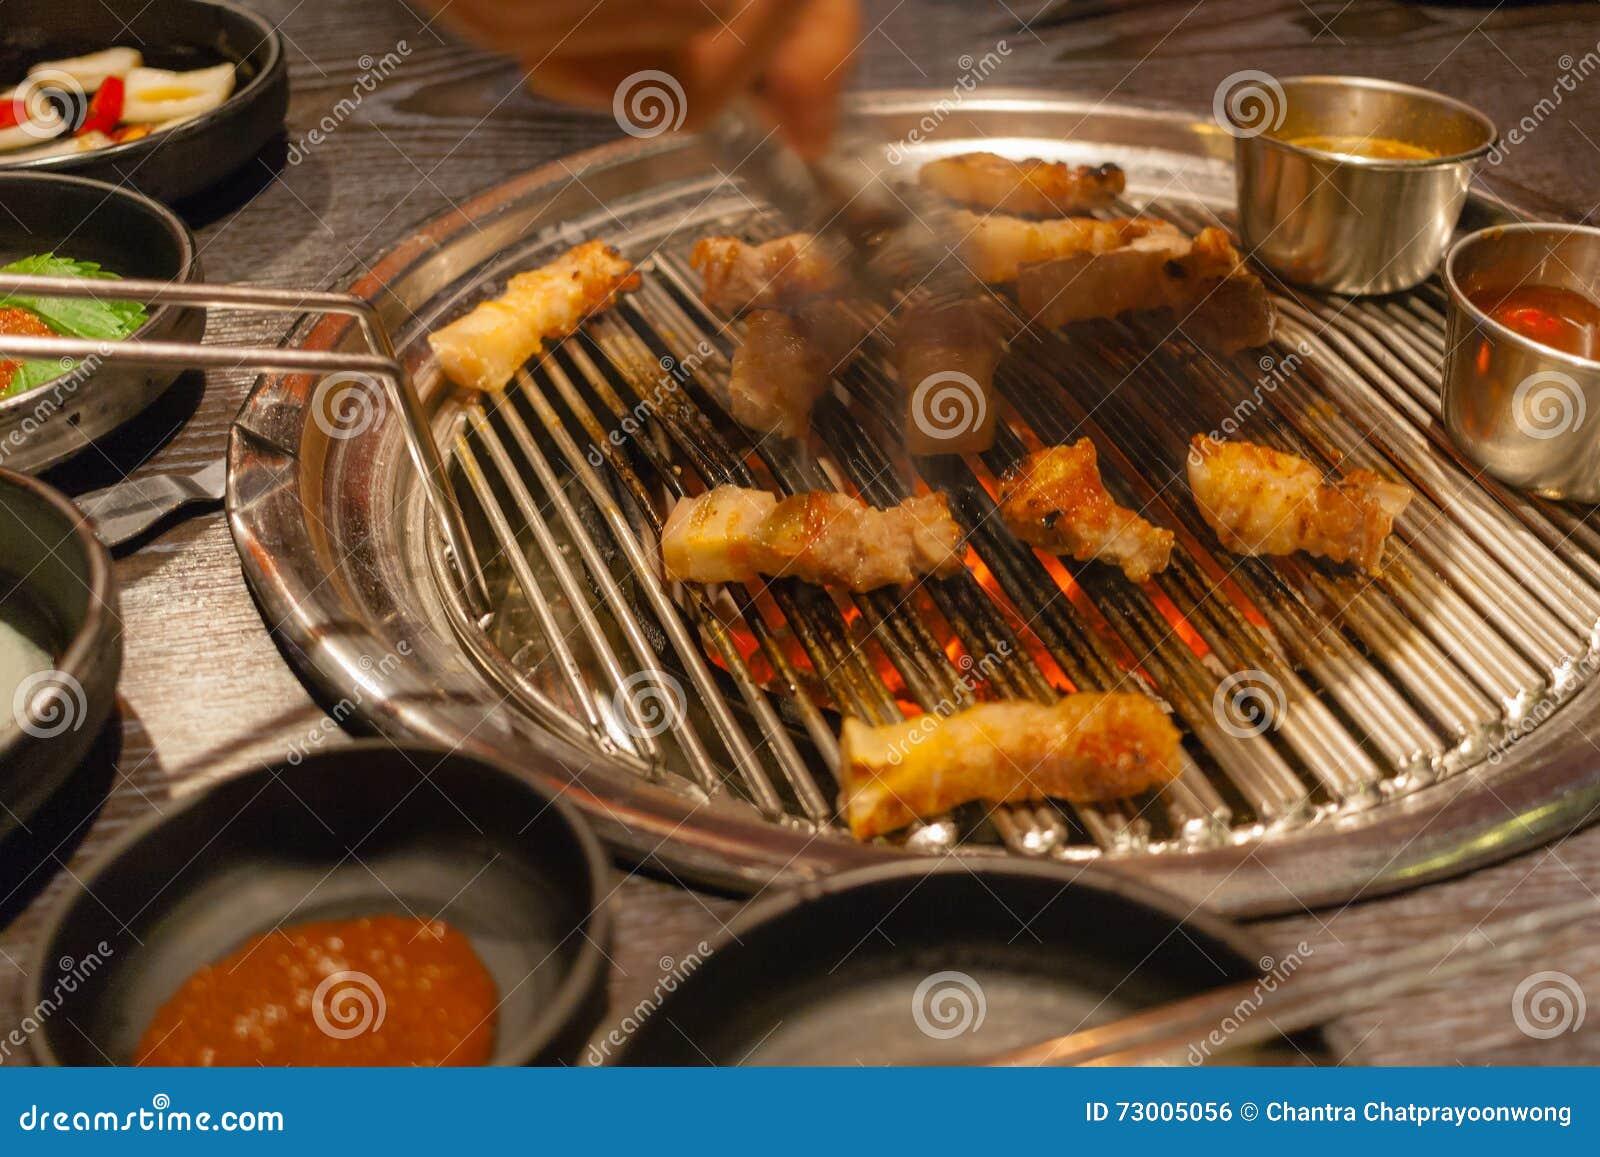 Bbq Belly Grilled Korean Pork